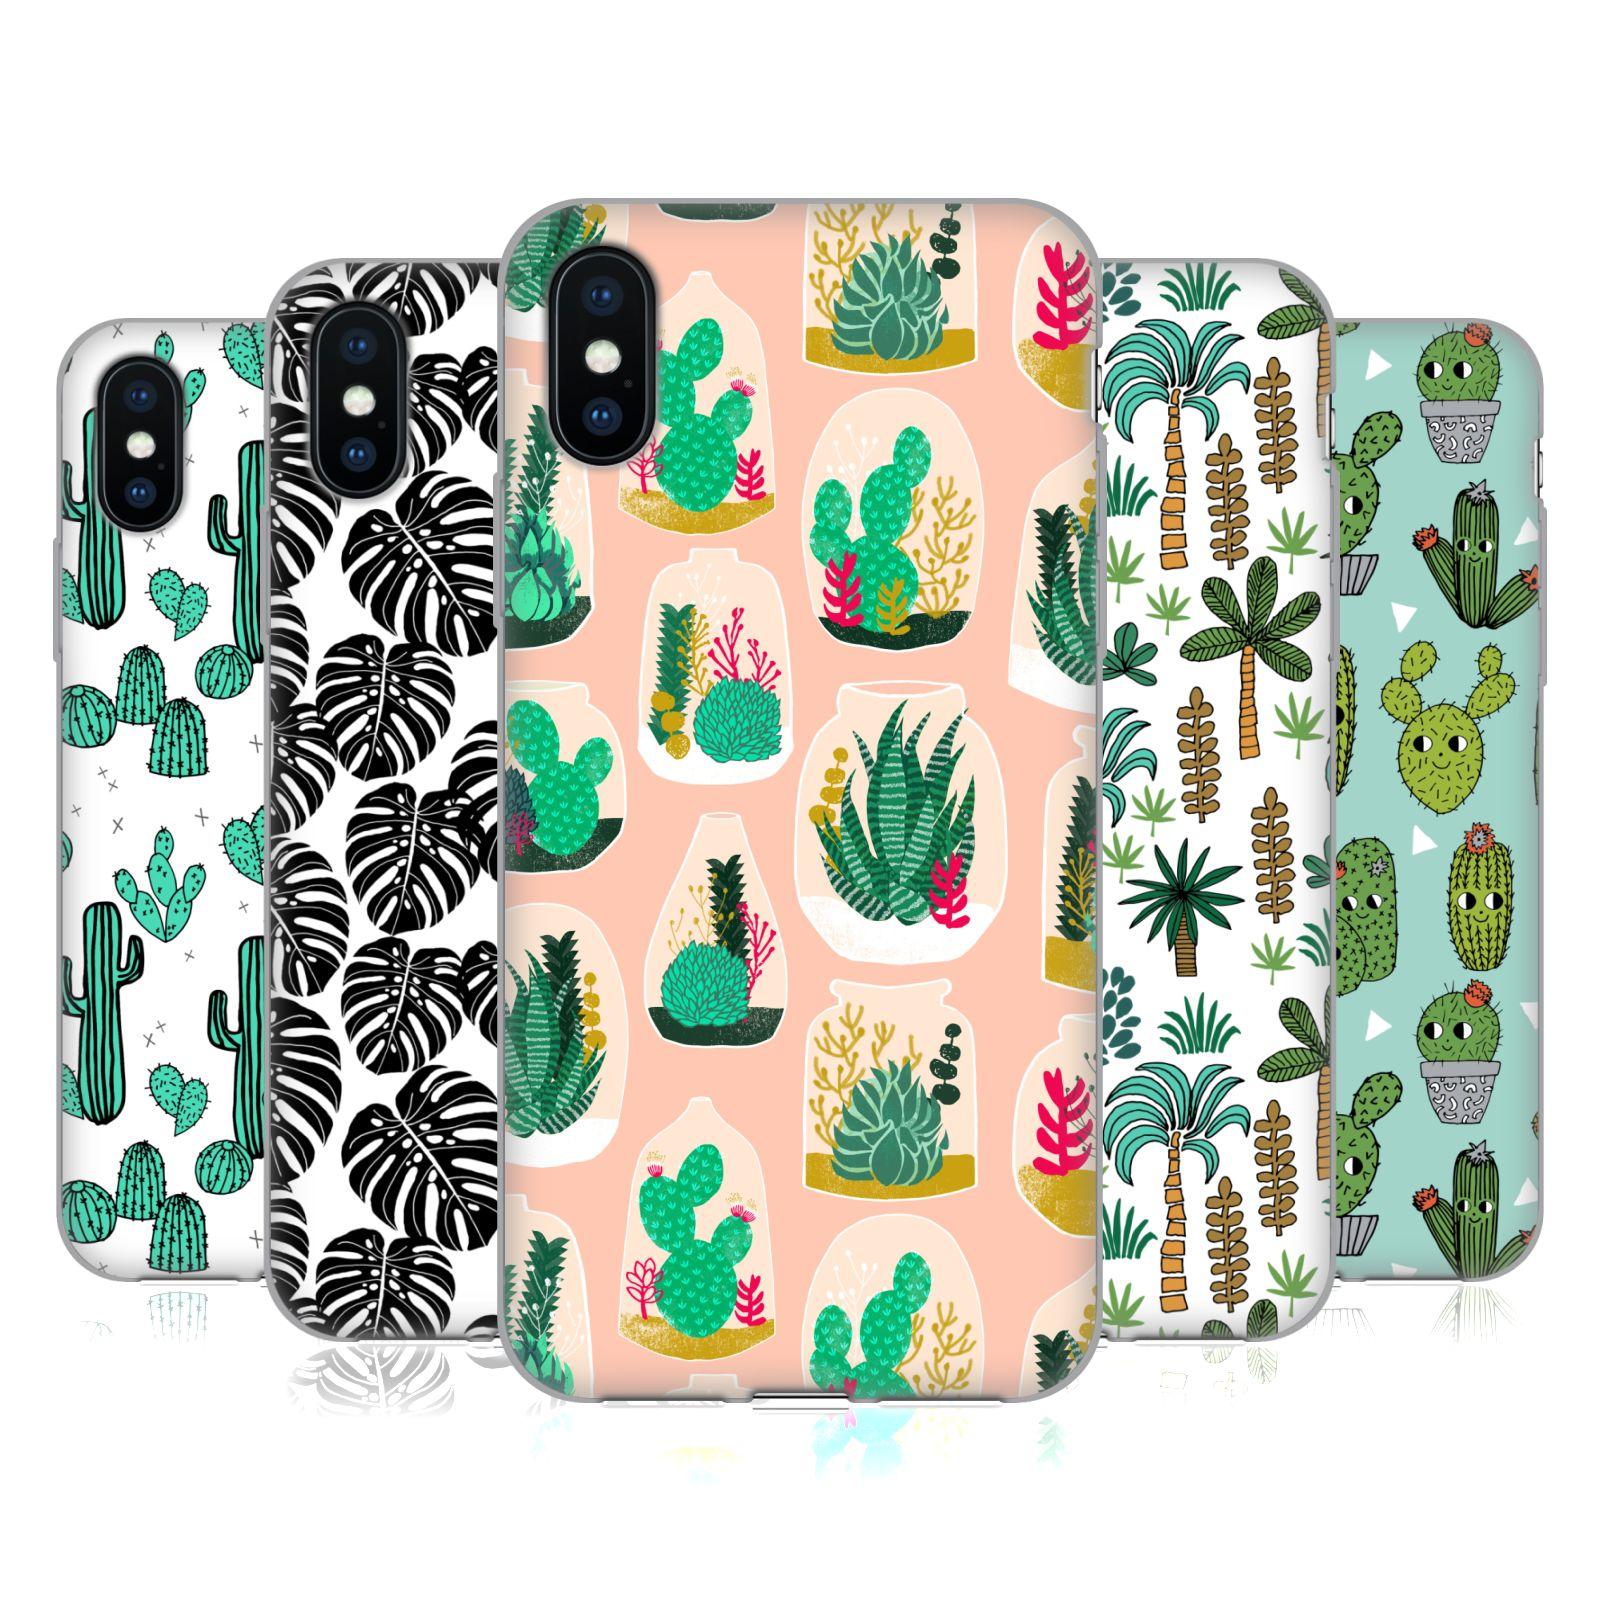 Andrea Lauren Design <!--translate-lineup-->Plant Pattern<!--translate-lineup-->